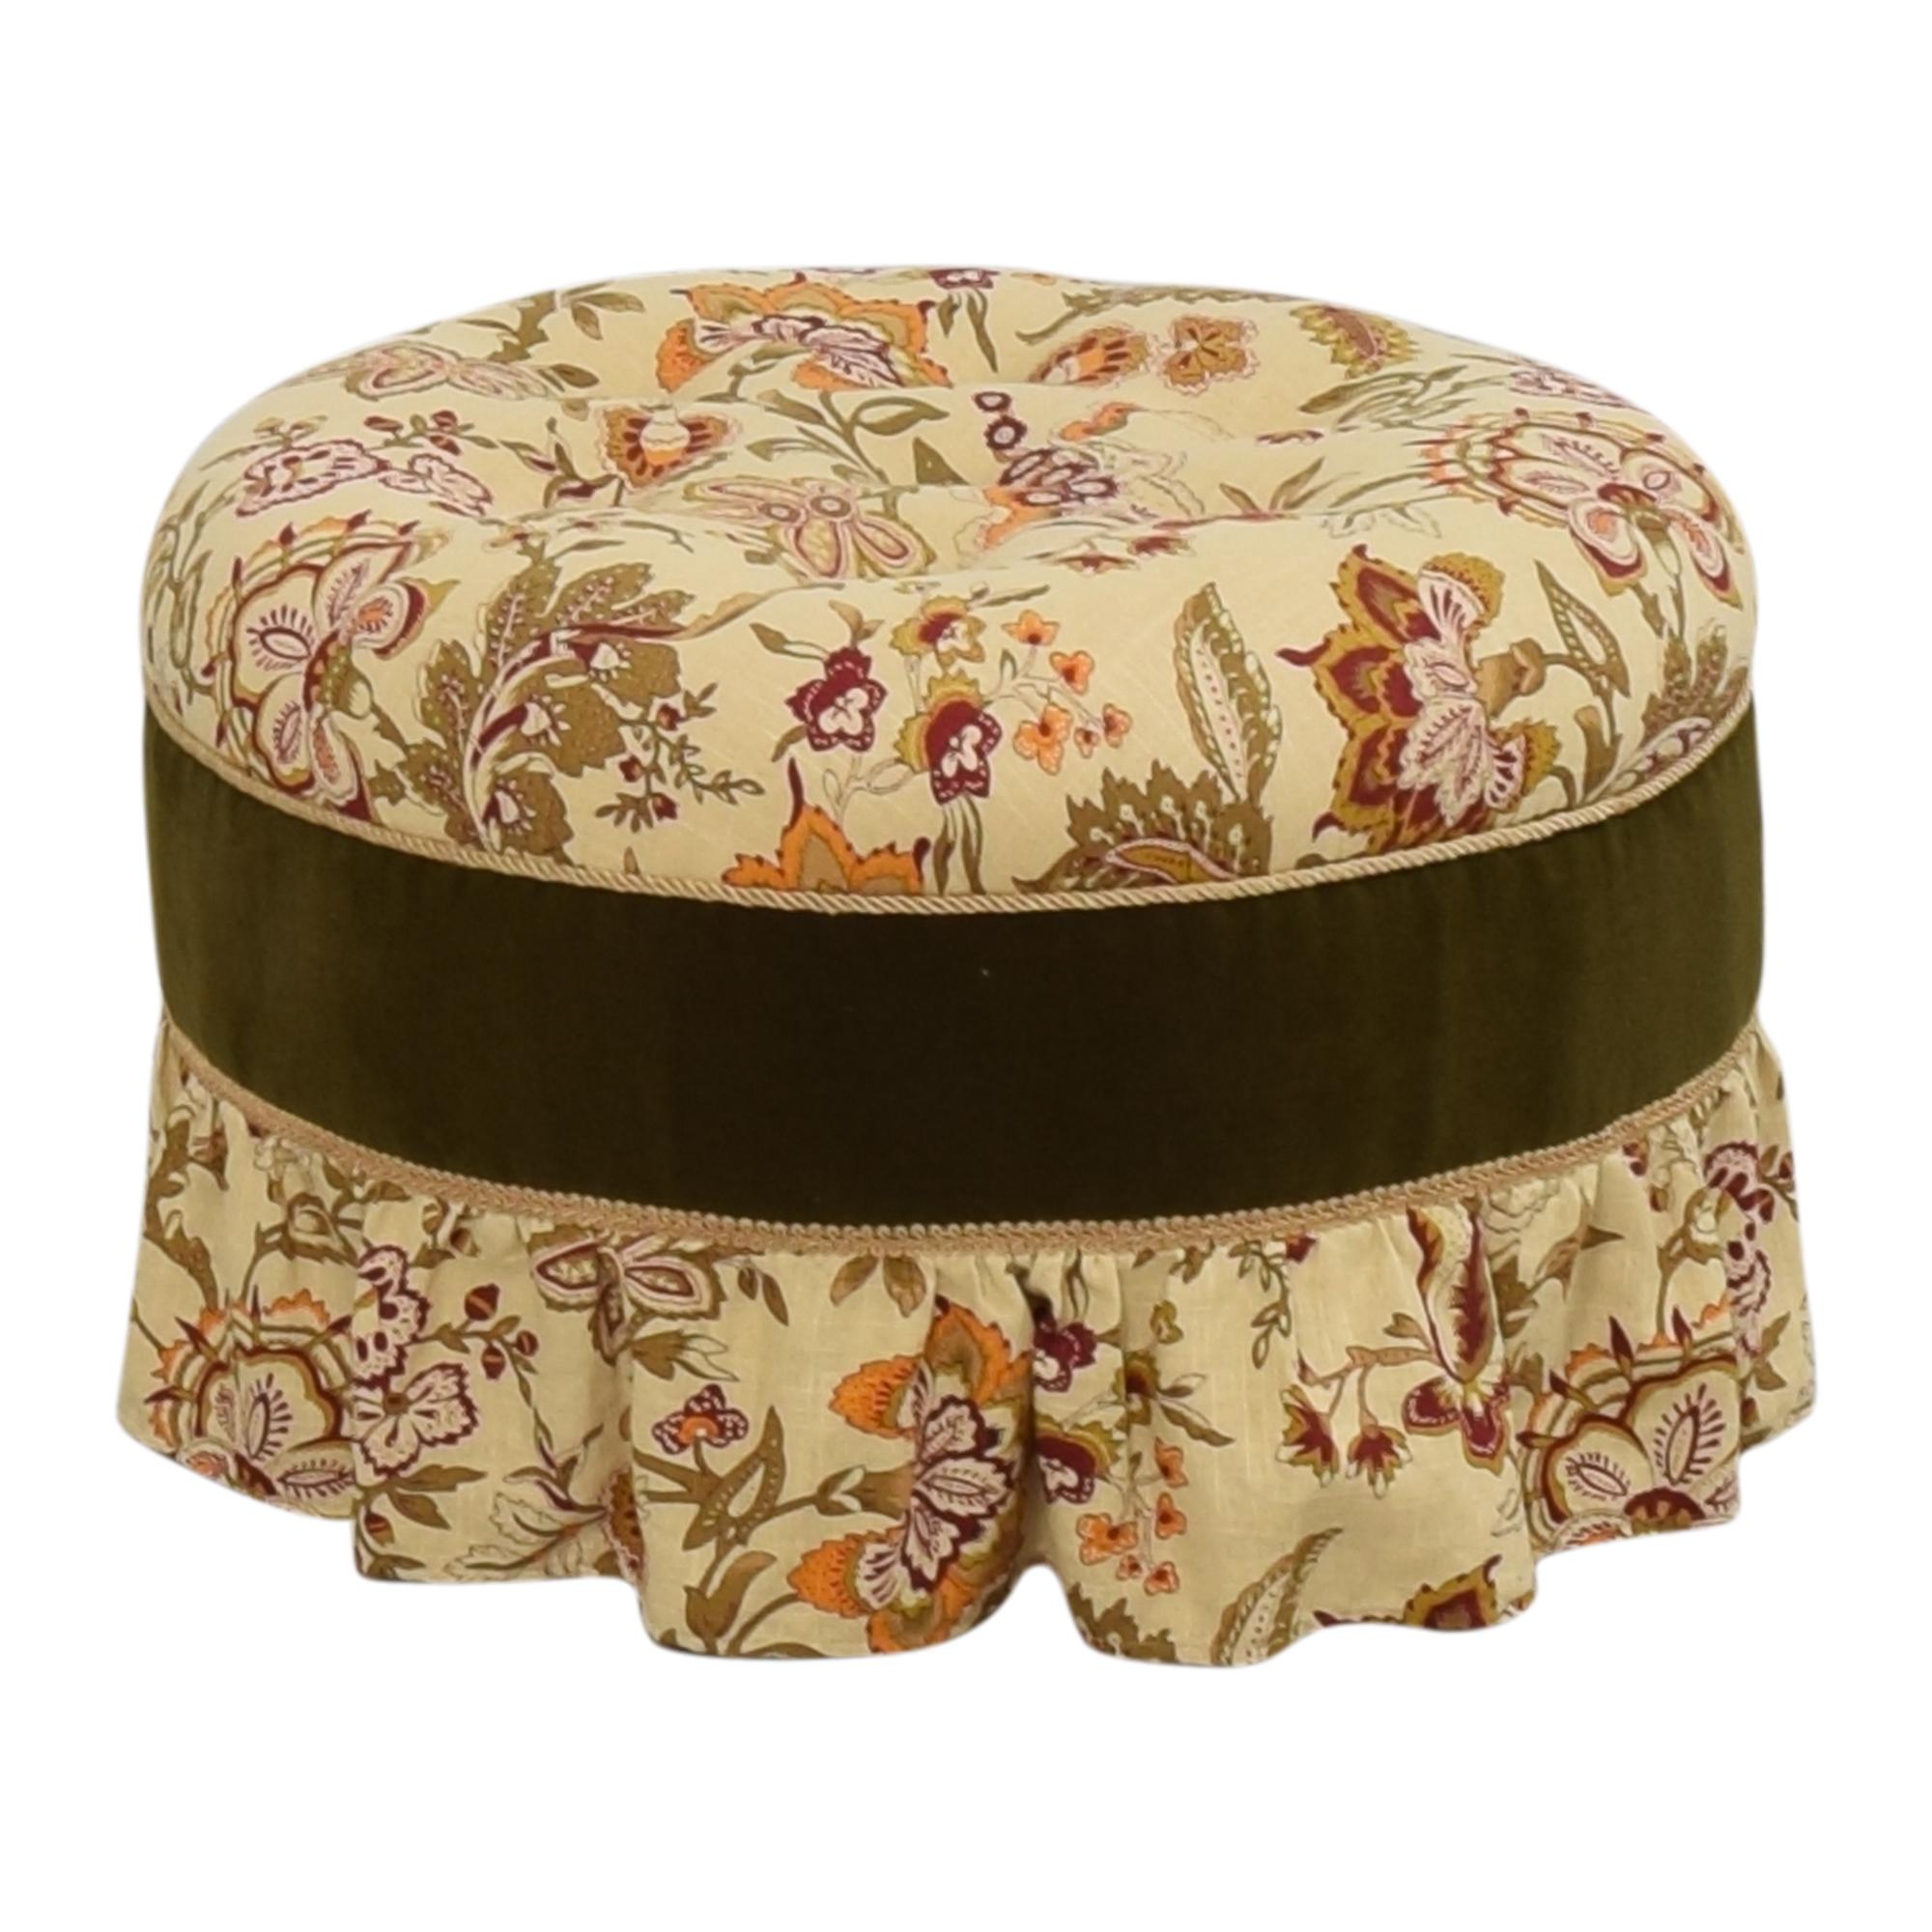 Skirted Round Ottoman